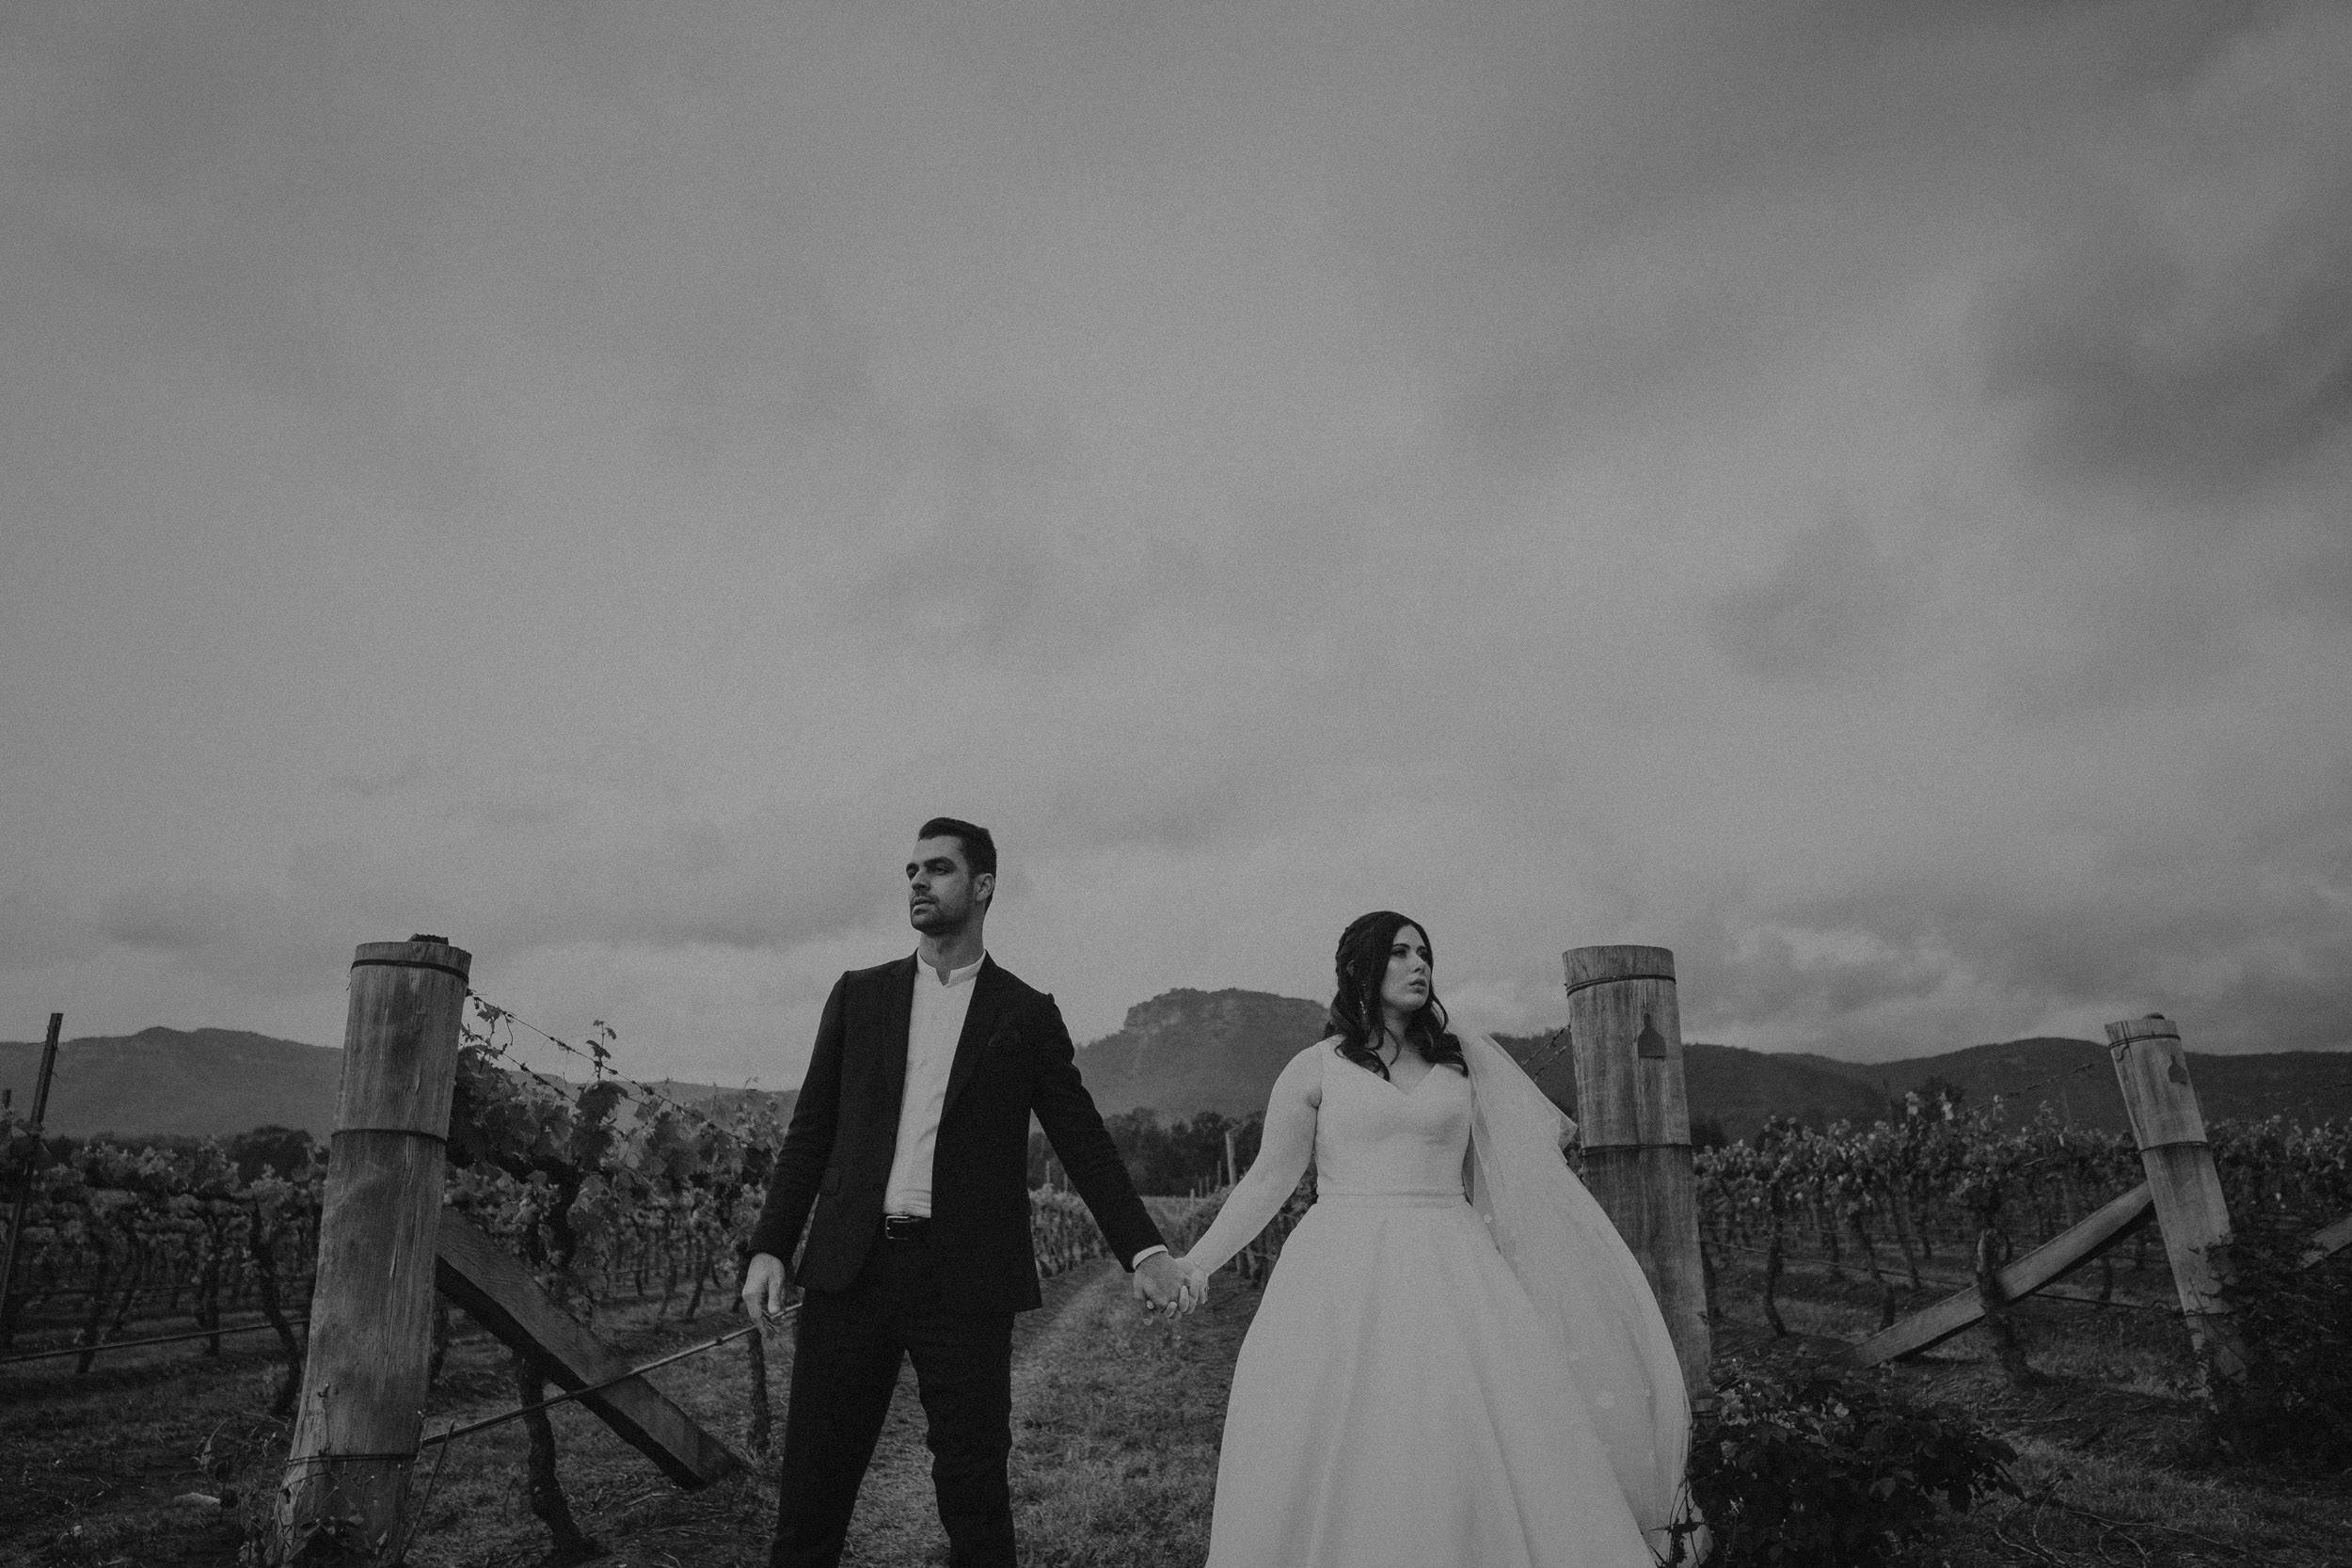 s+j_top_elopement wedding photography_kings & thieves_blog - 432.jpg